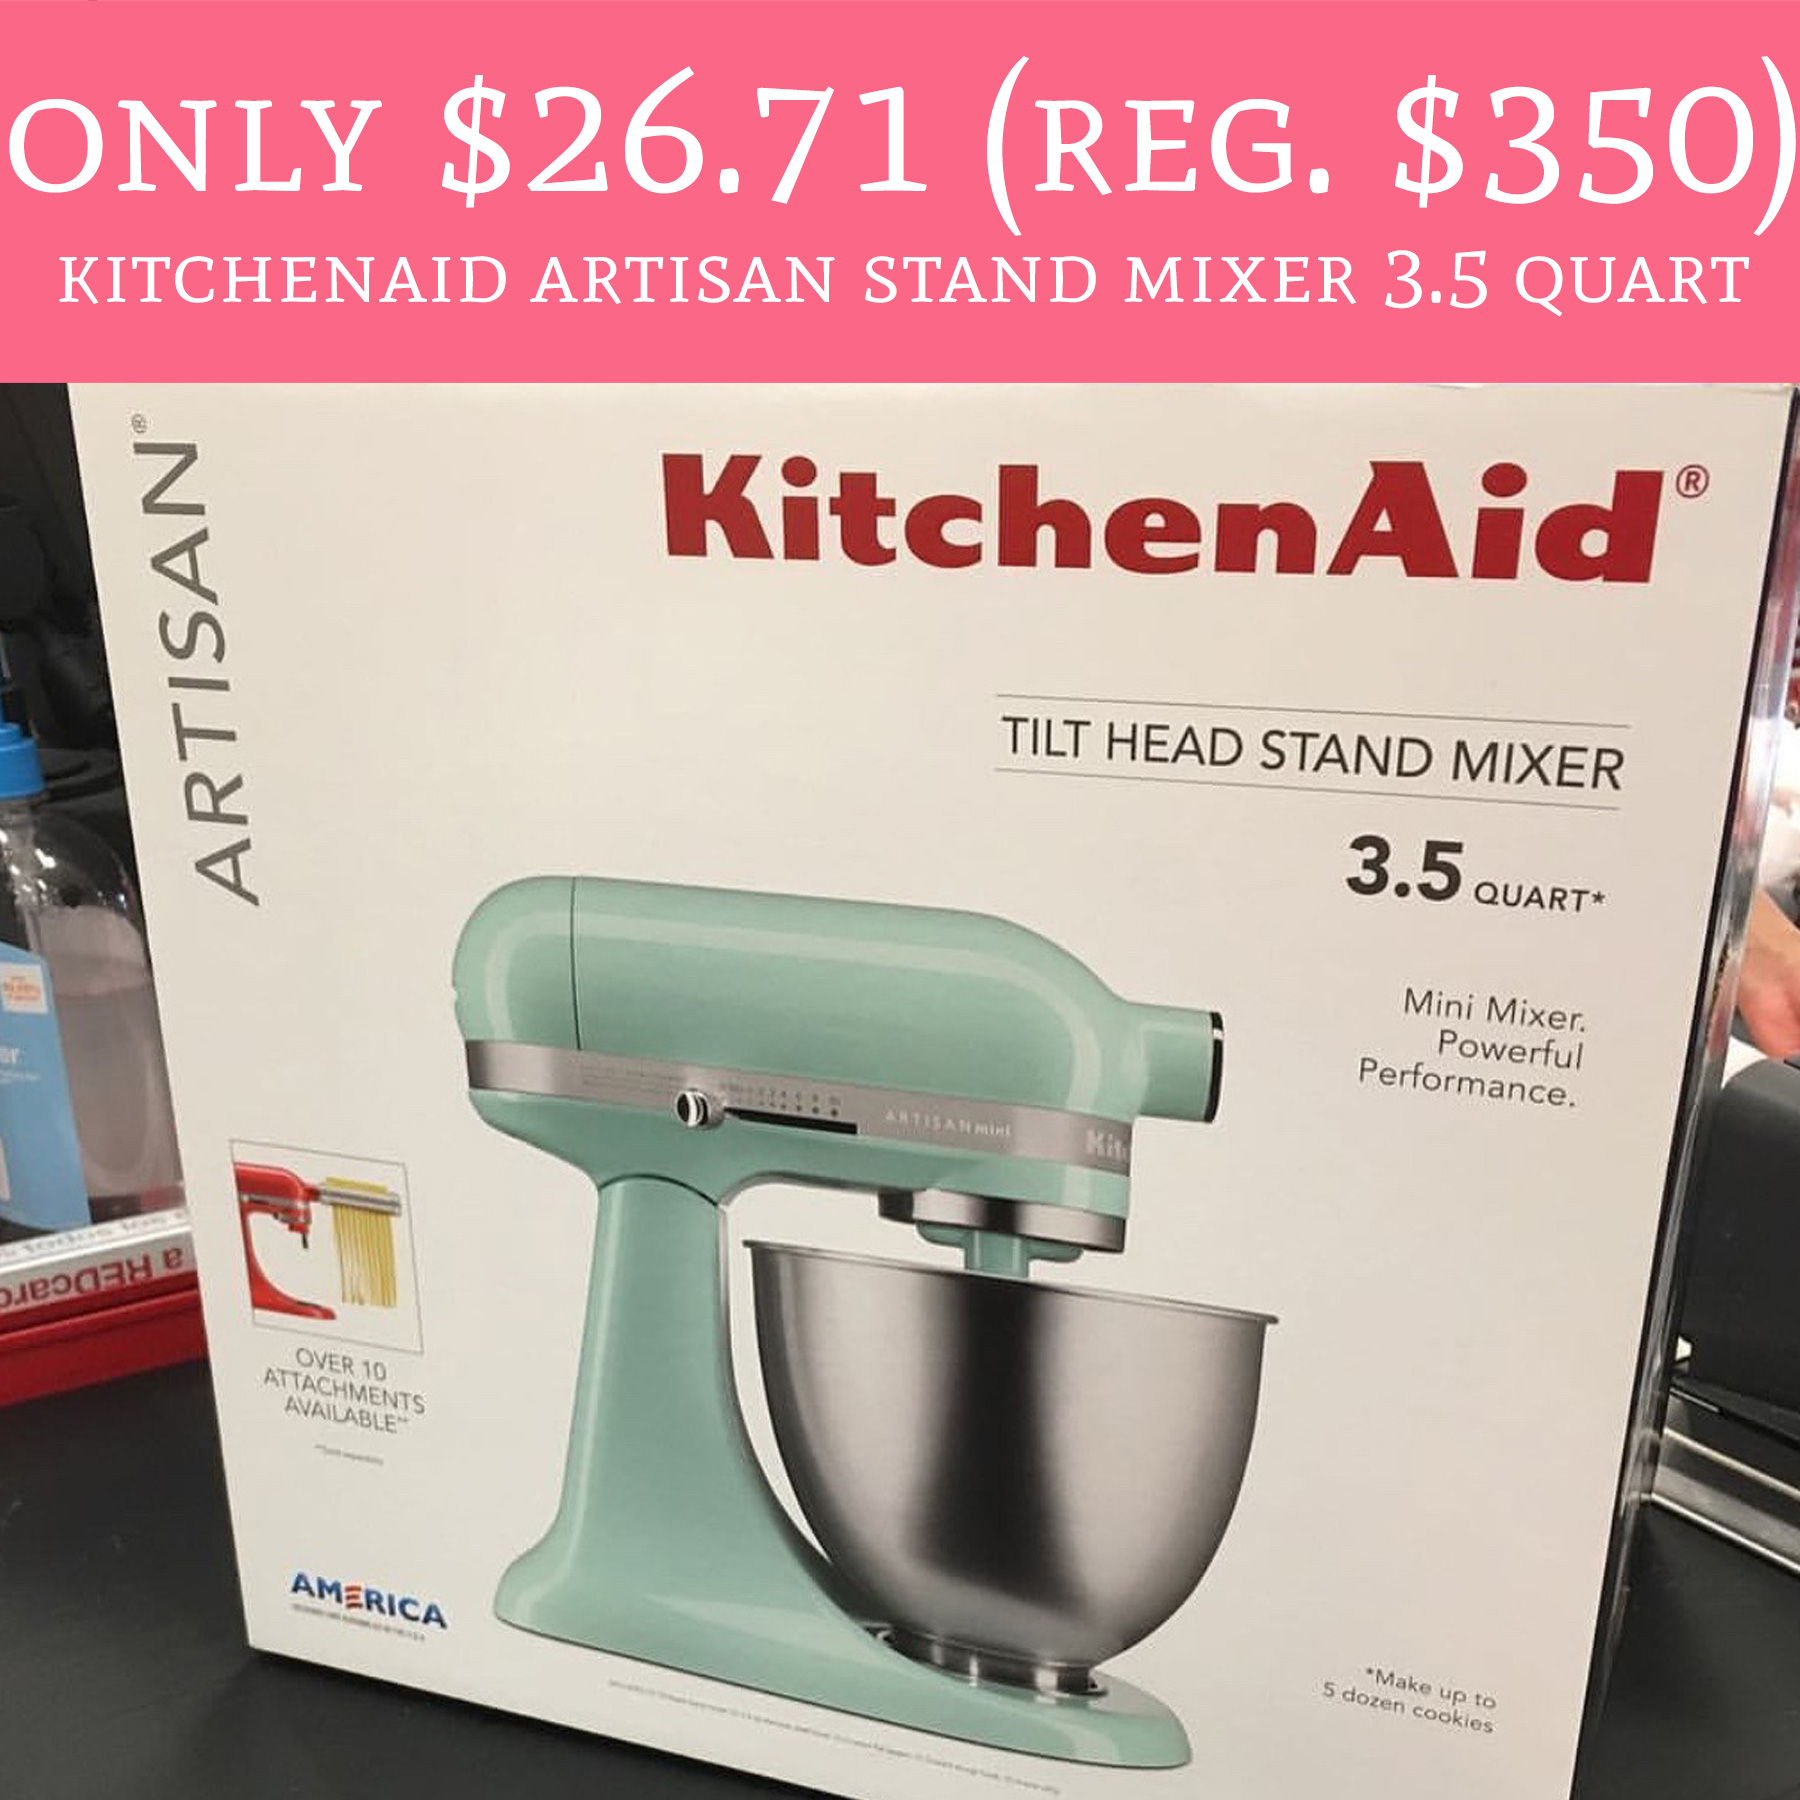 Only 2671 Regular 350 KitchenAid Artisan Stand Mixer